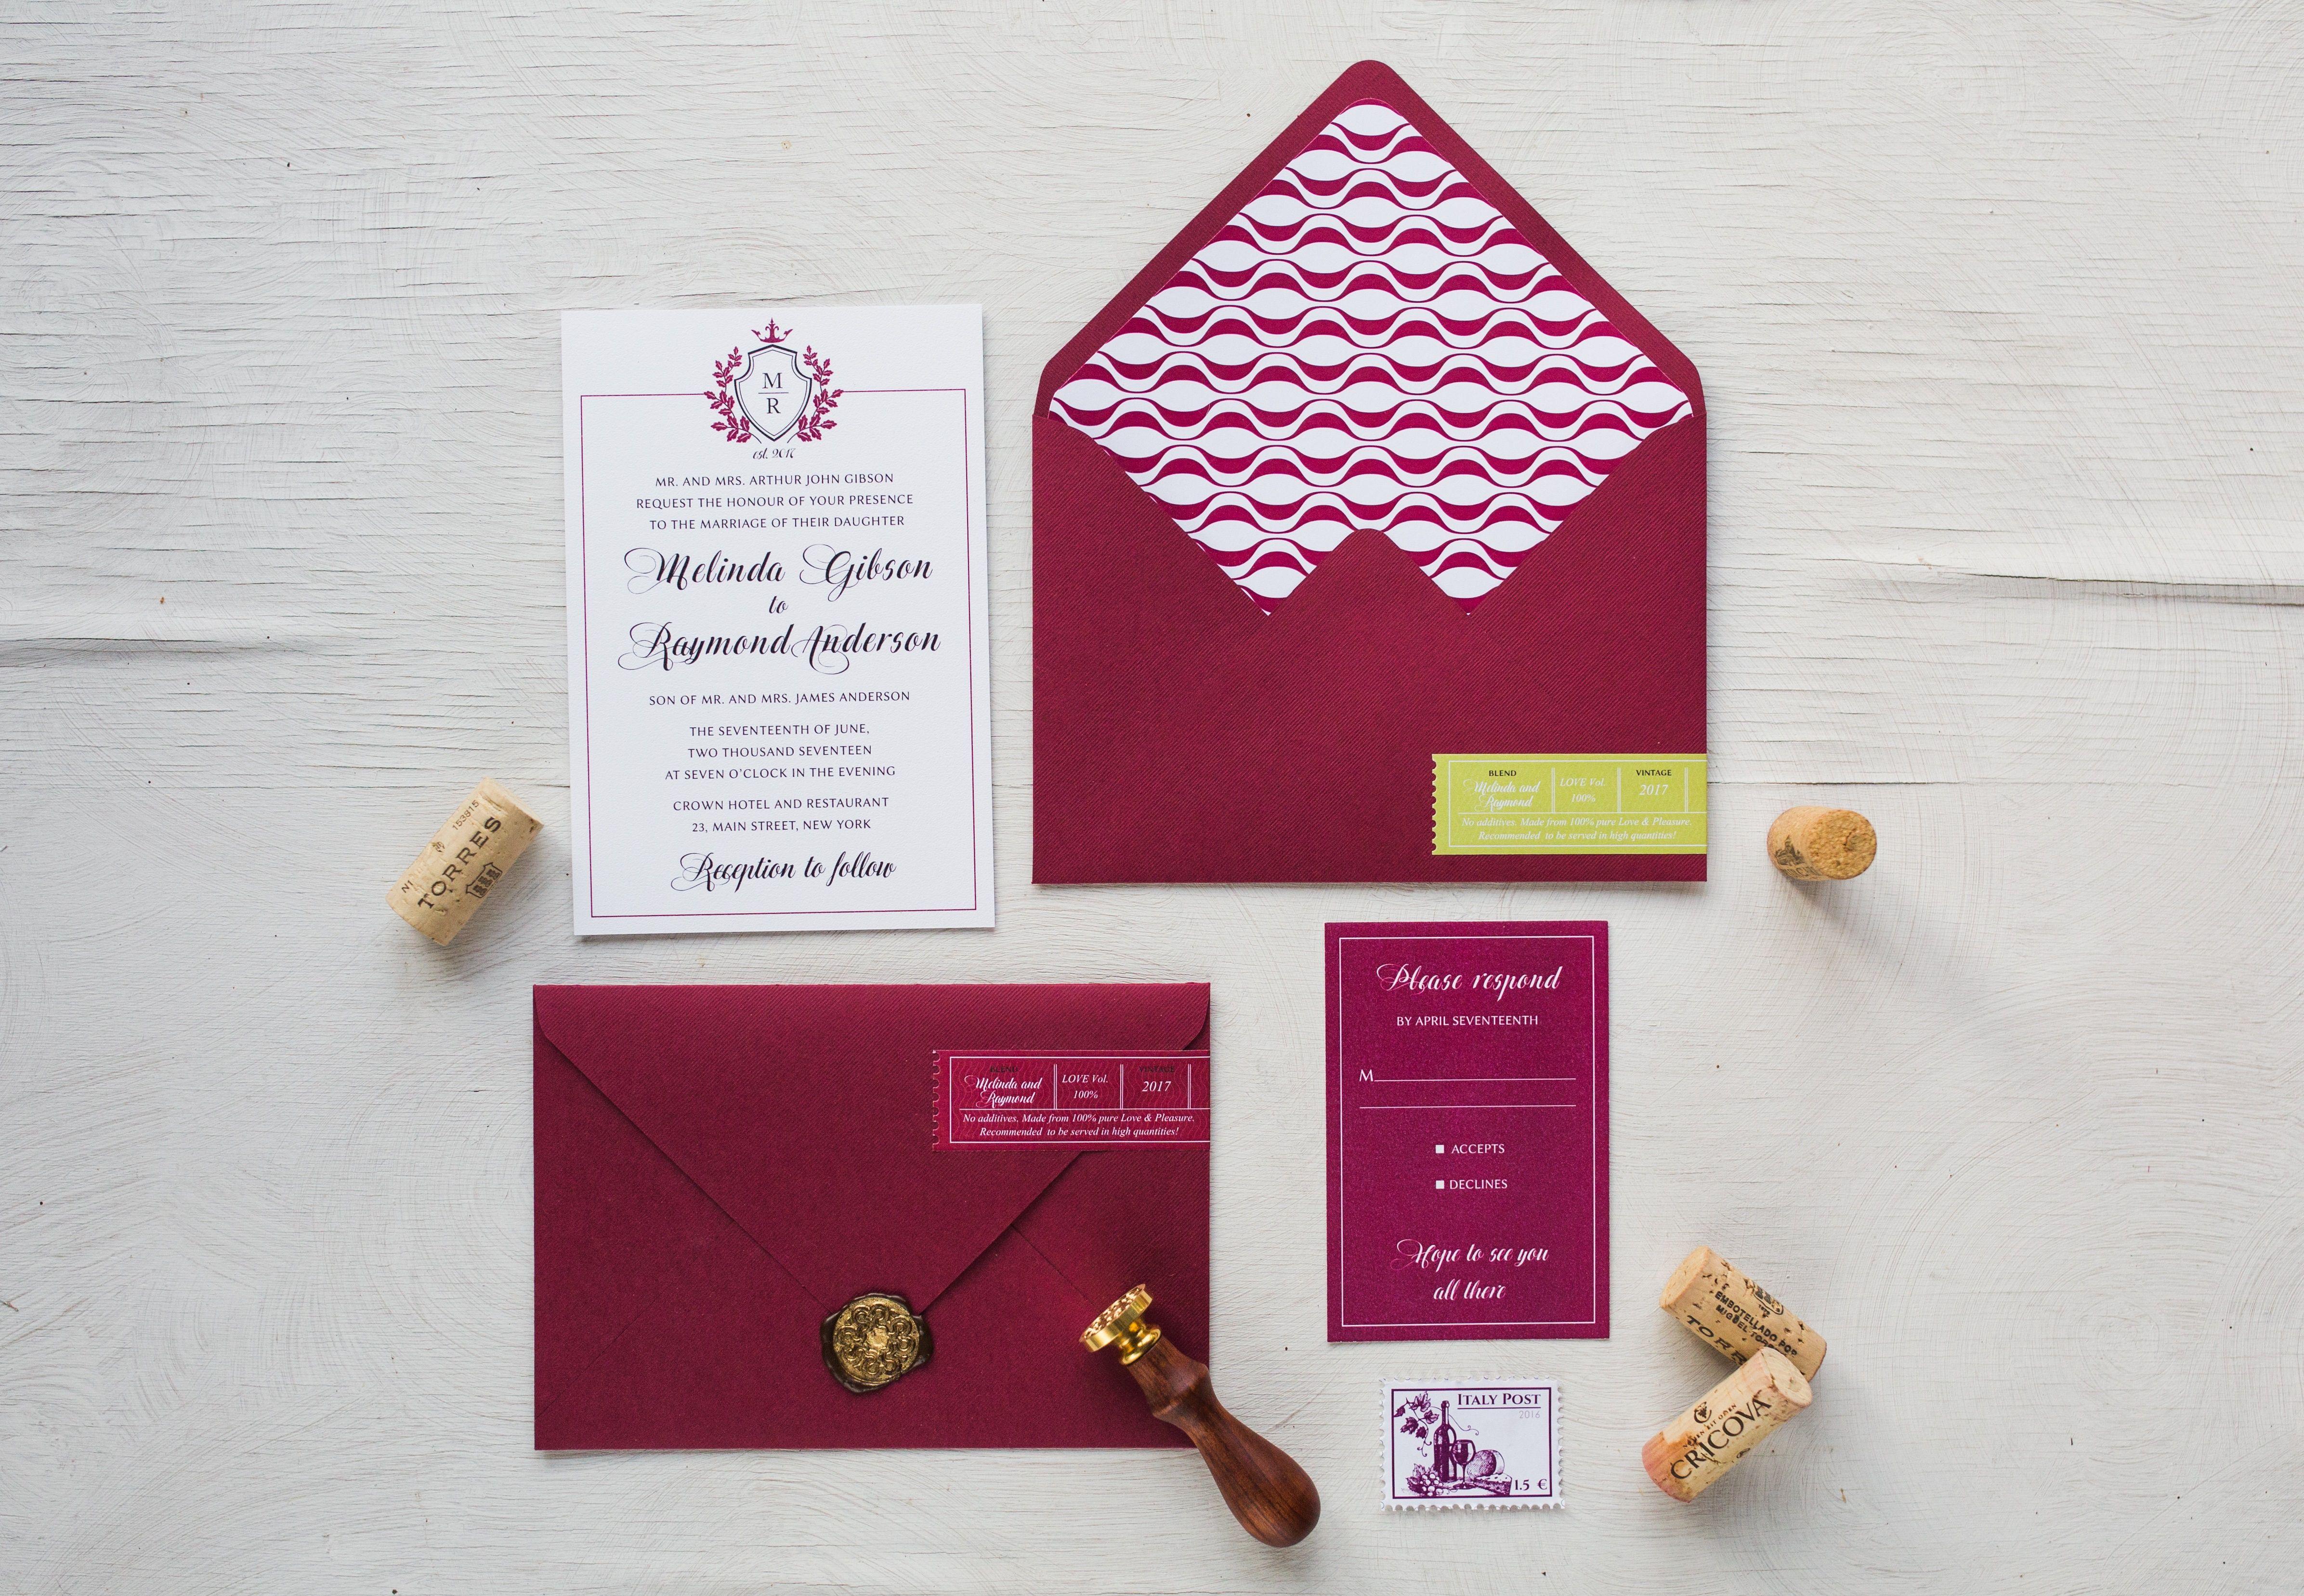 Copy Vineyard Wedding Invitations | Lenq.me